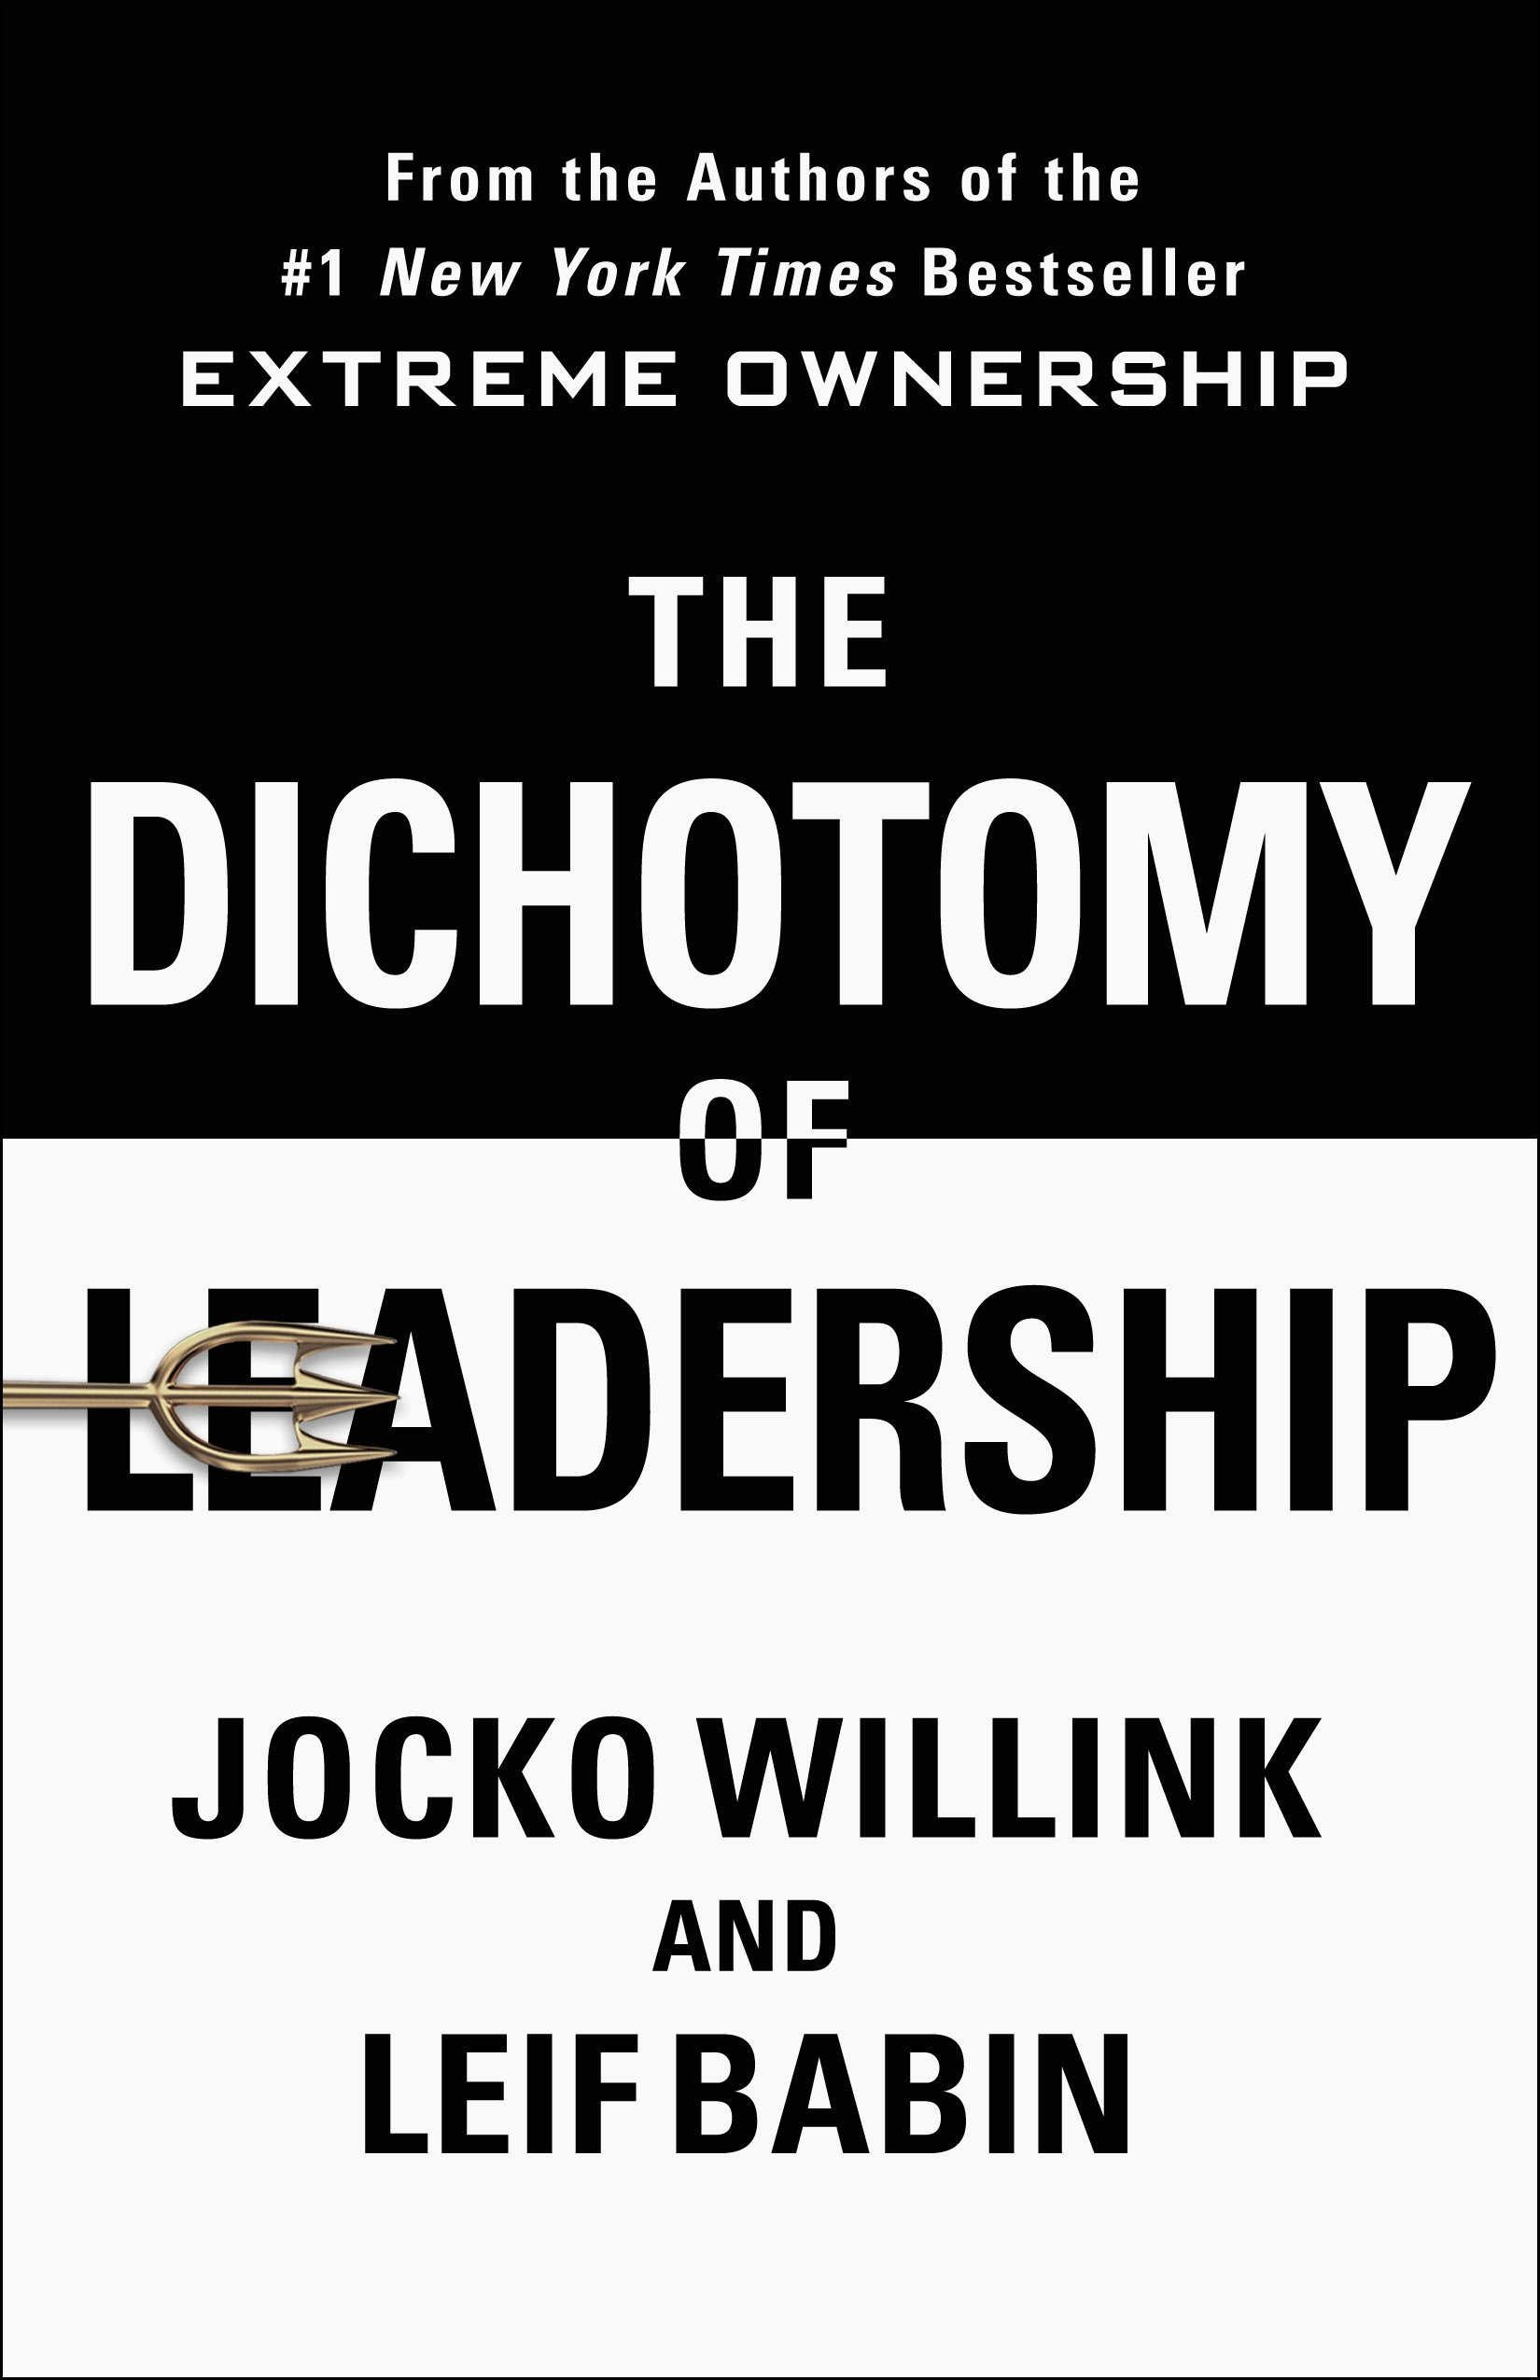 dichotomy-of-leadership-jocko-willink-leif-babin-book-cover.jpg